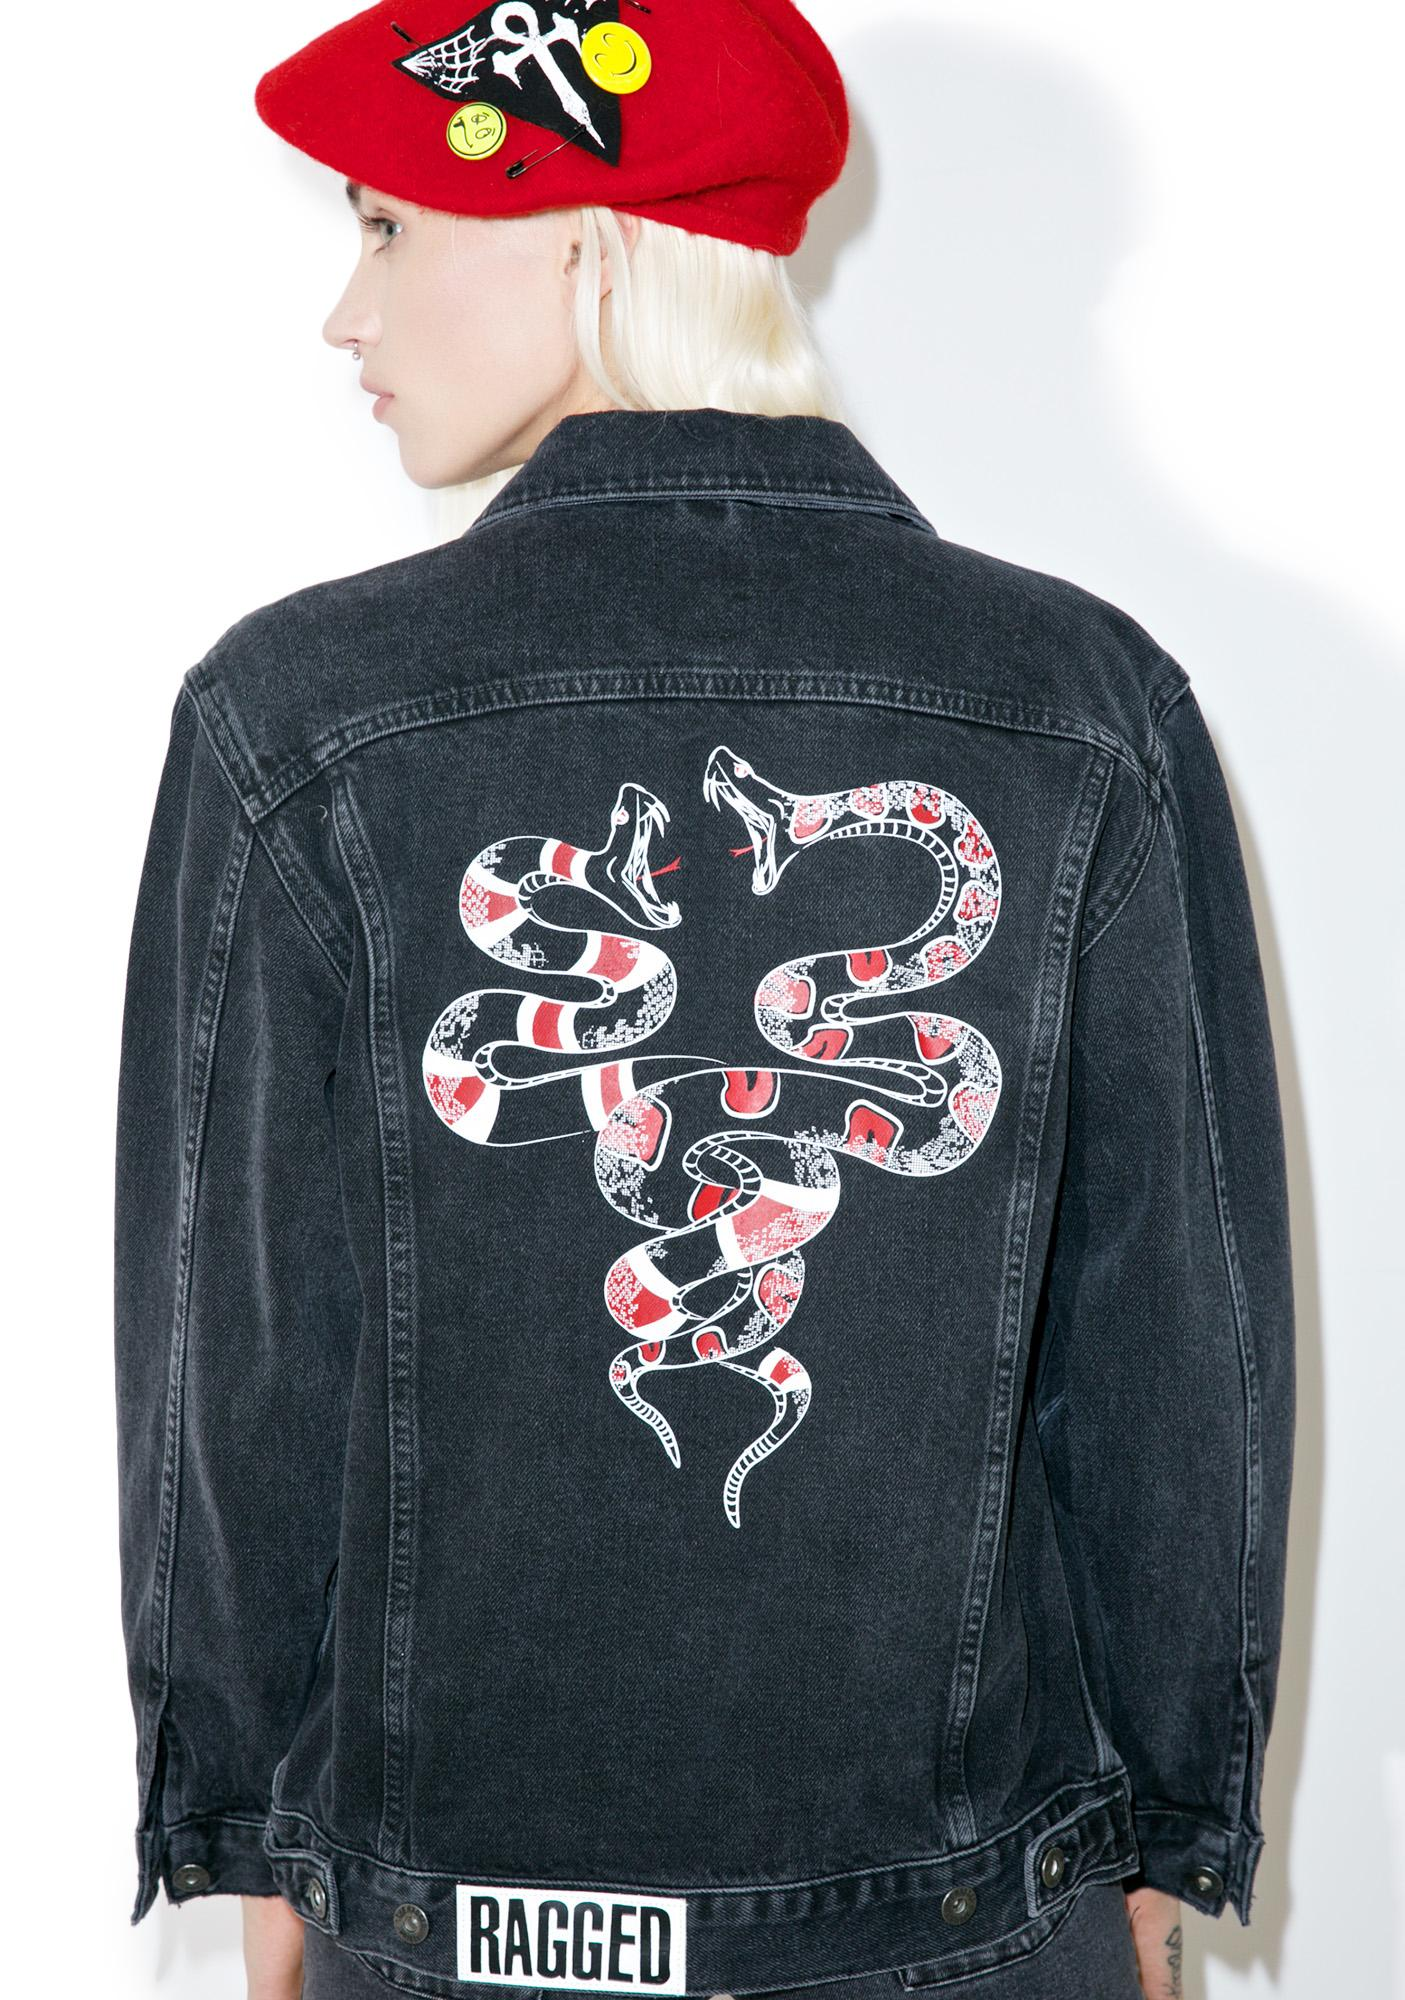 The Ragged Priest Skin Denim Jacket